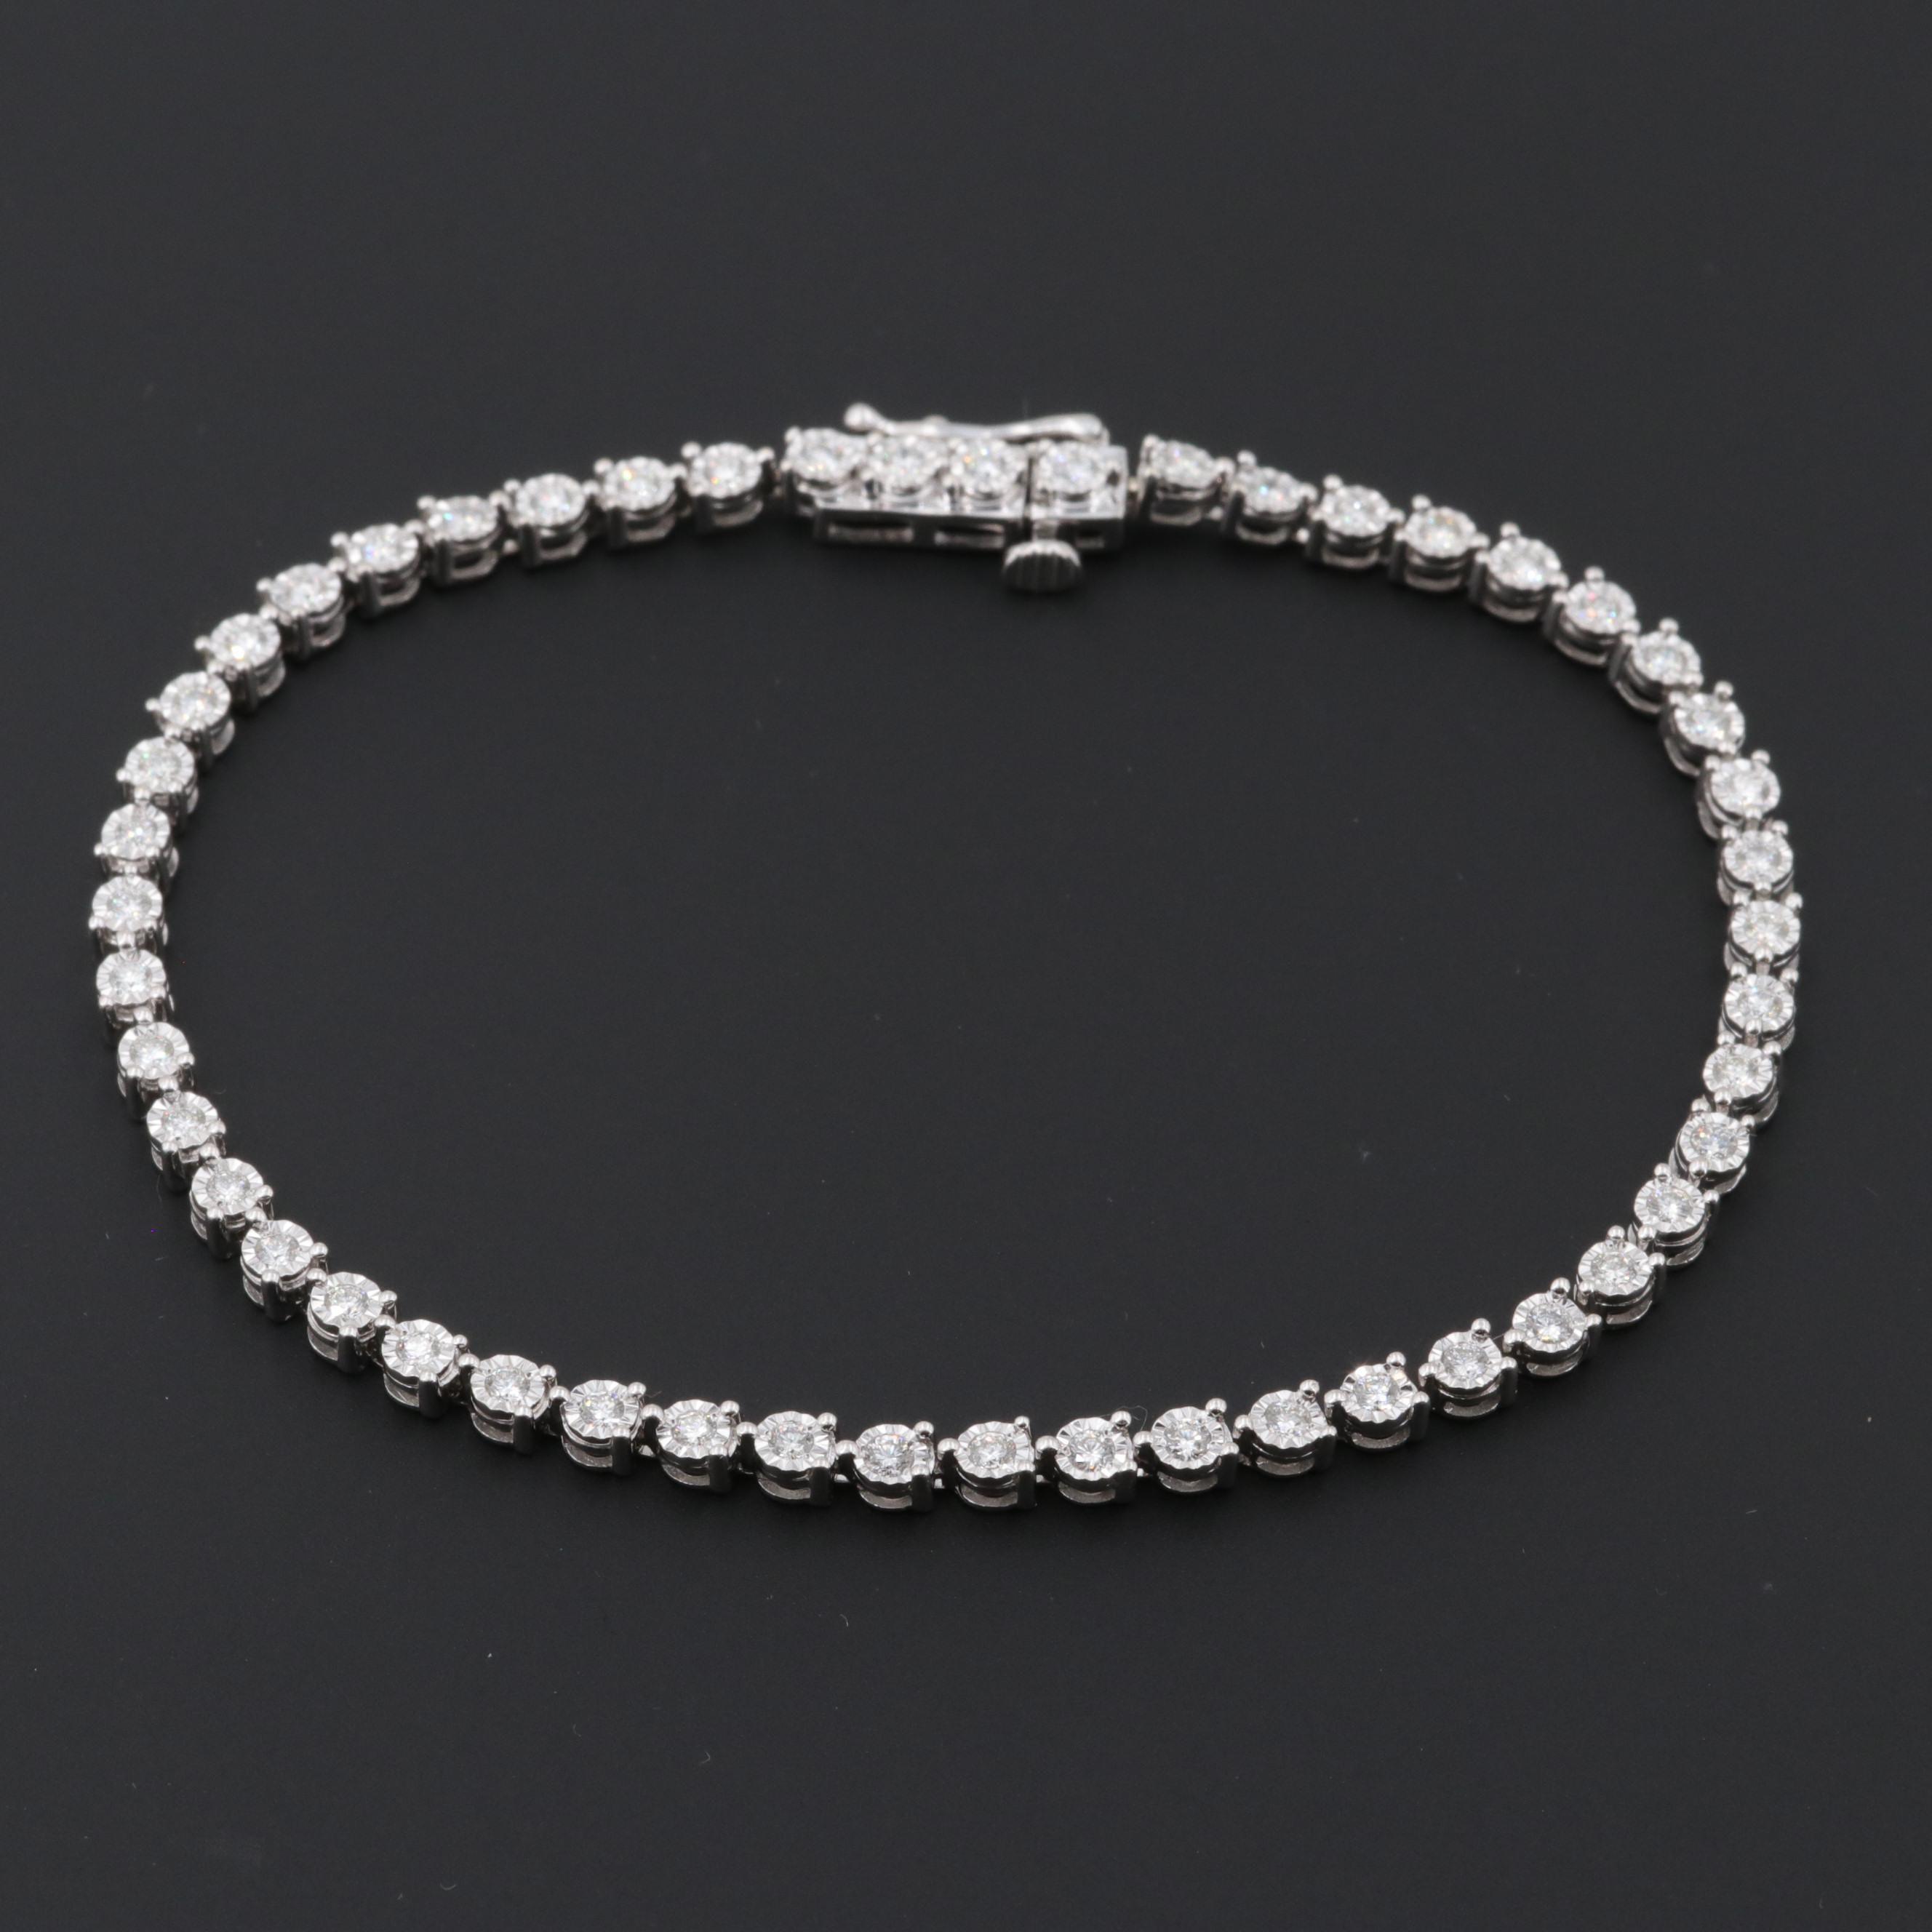 14K White Gold 1.12 CTW Diamond Tennis Bracelet